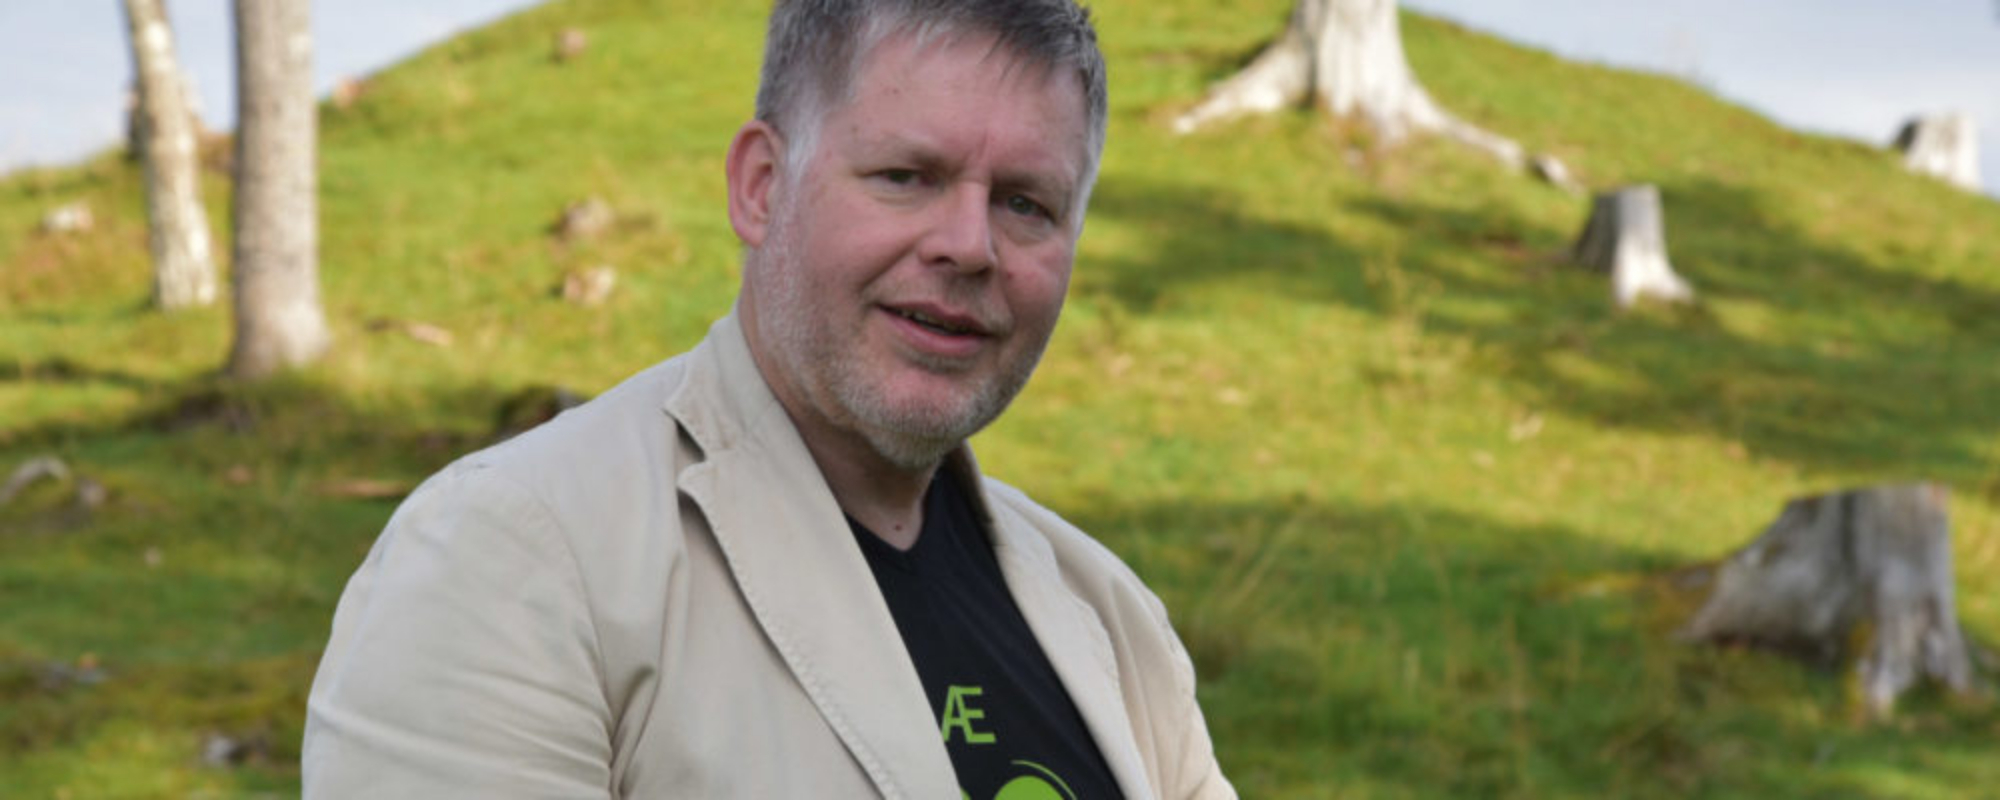 Lars Forseth